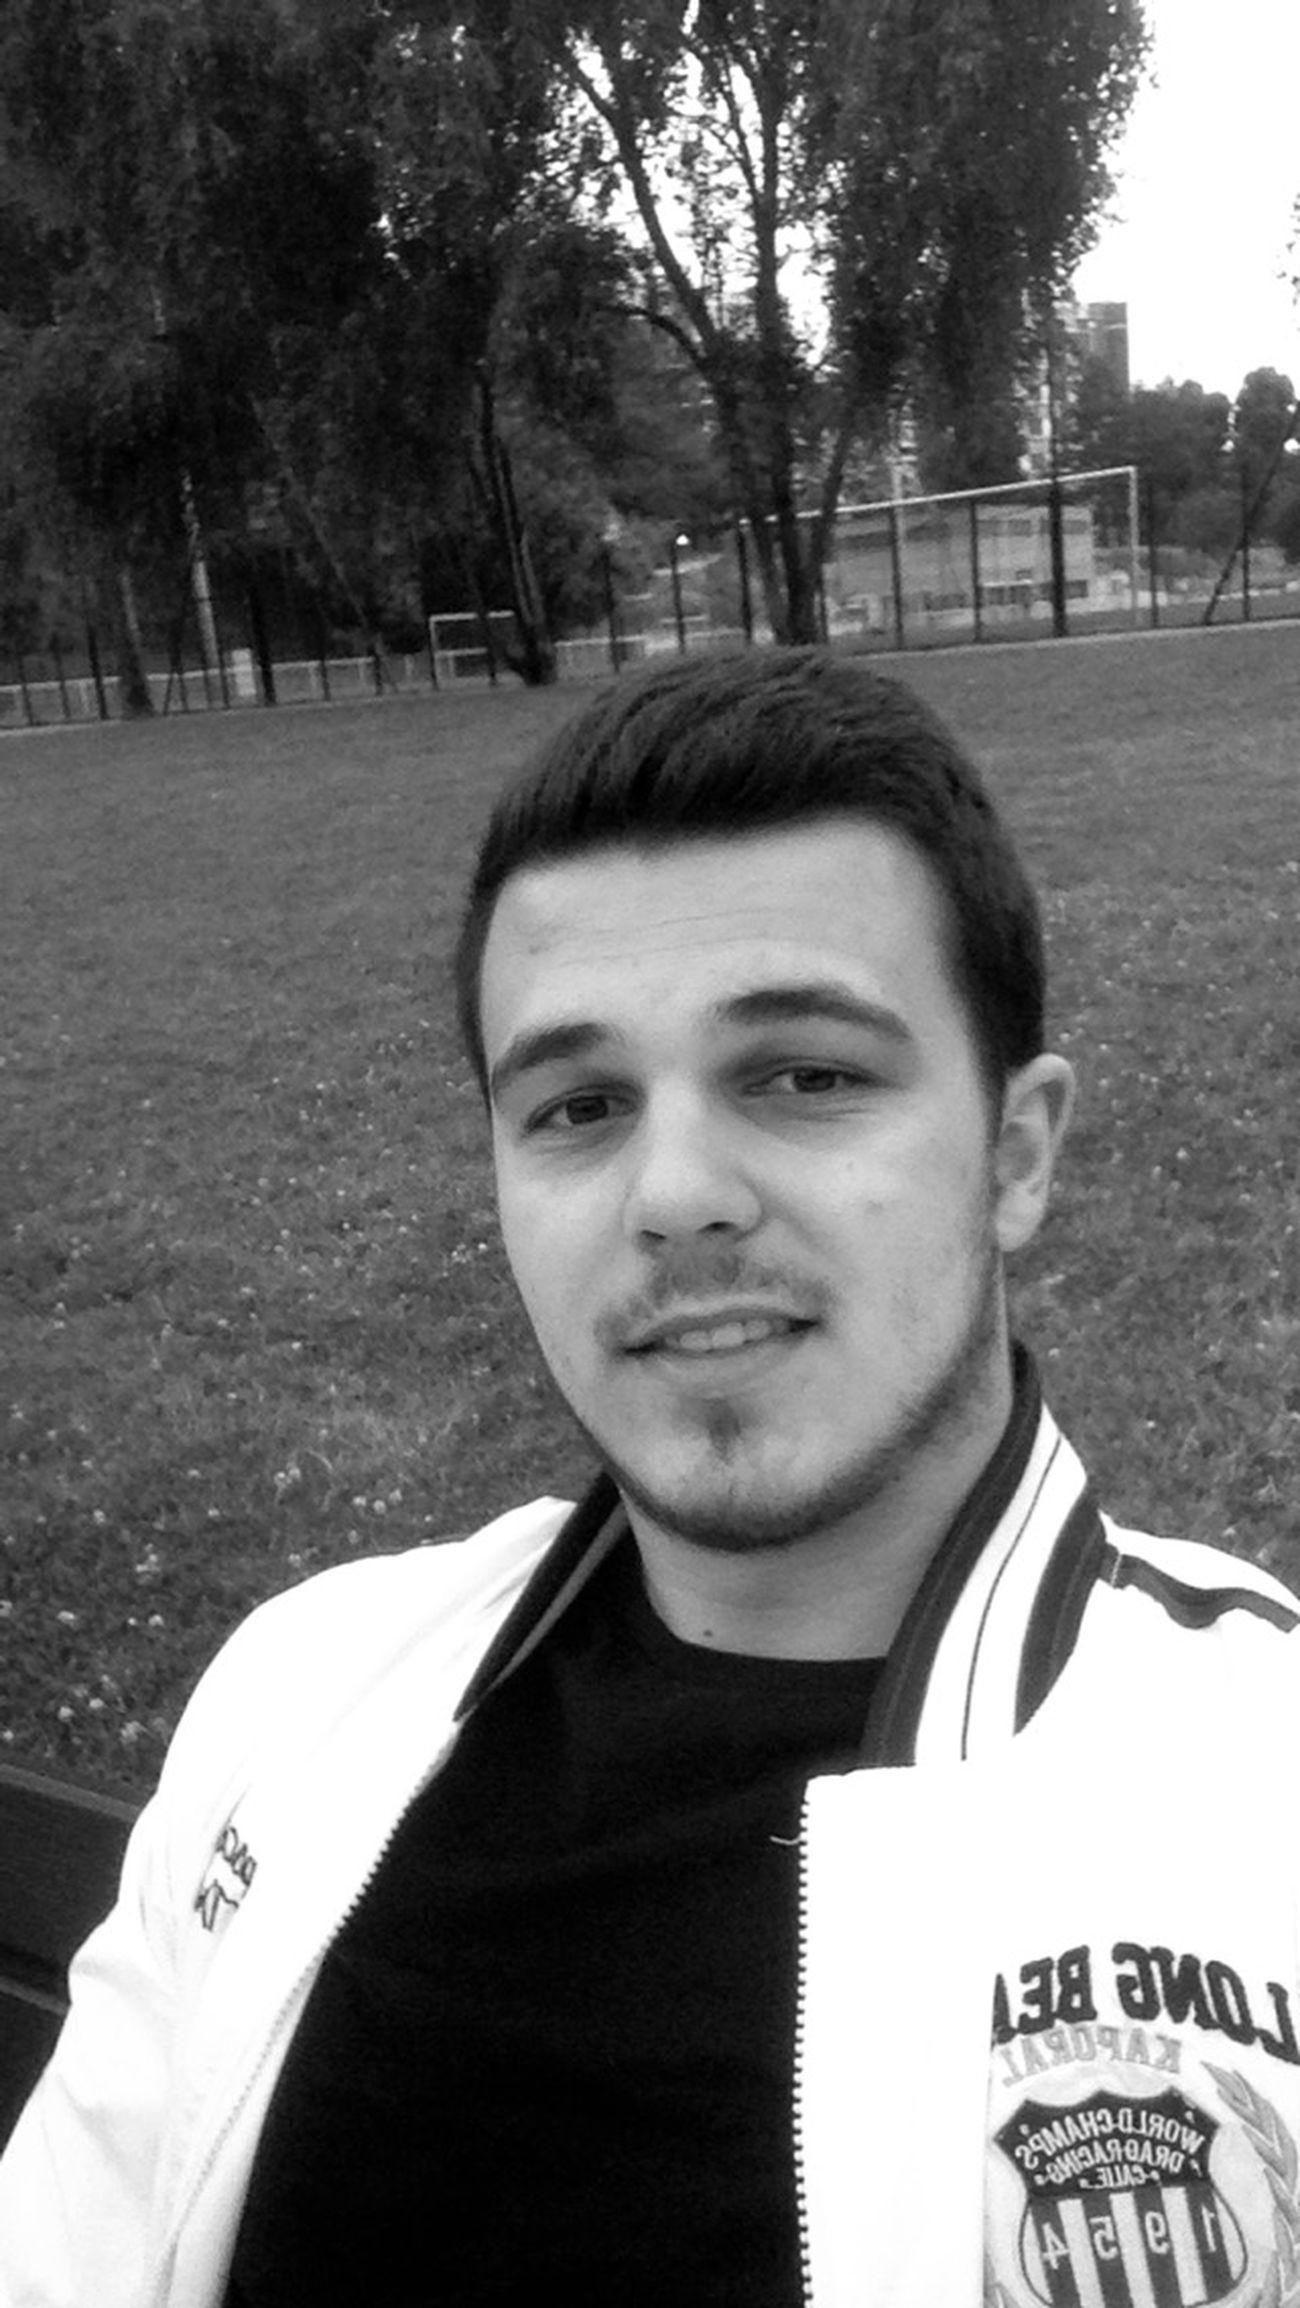 Me Photooftheday Urban Paris13 Smile Selfie ✌